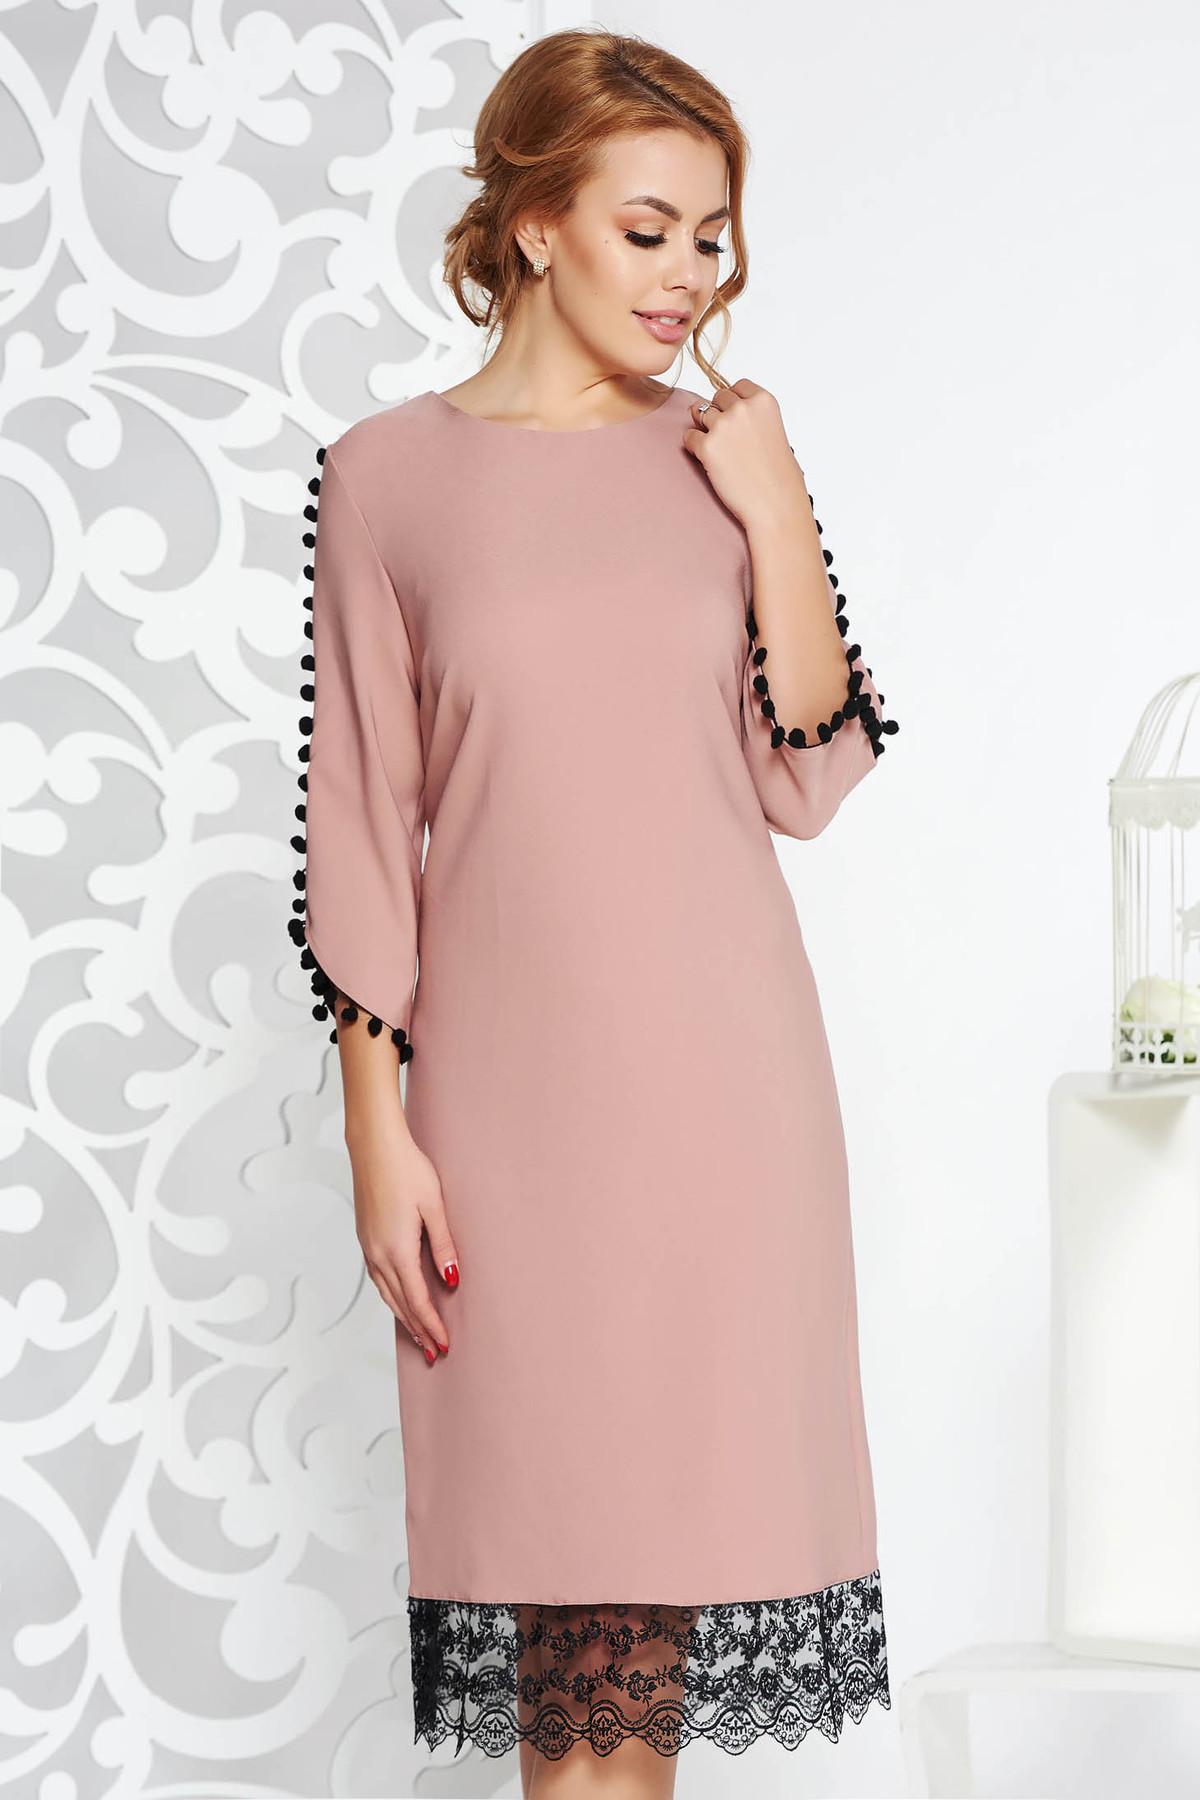 Rochie rosa eleganta cu un croi drept din material usor elastic cu aplicatii de dantela cu ciucuri